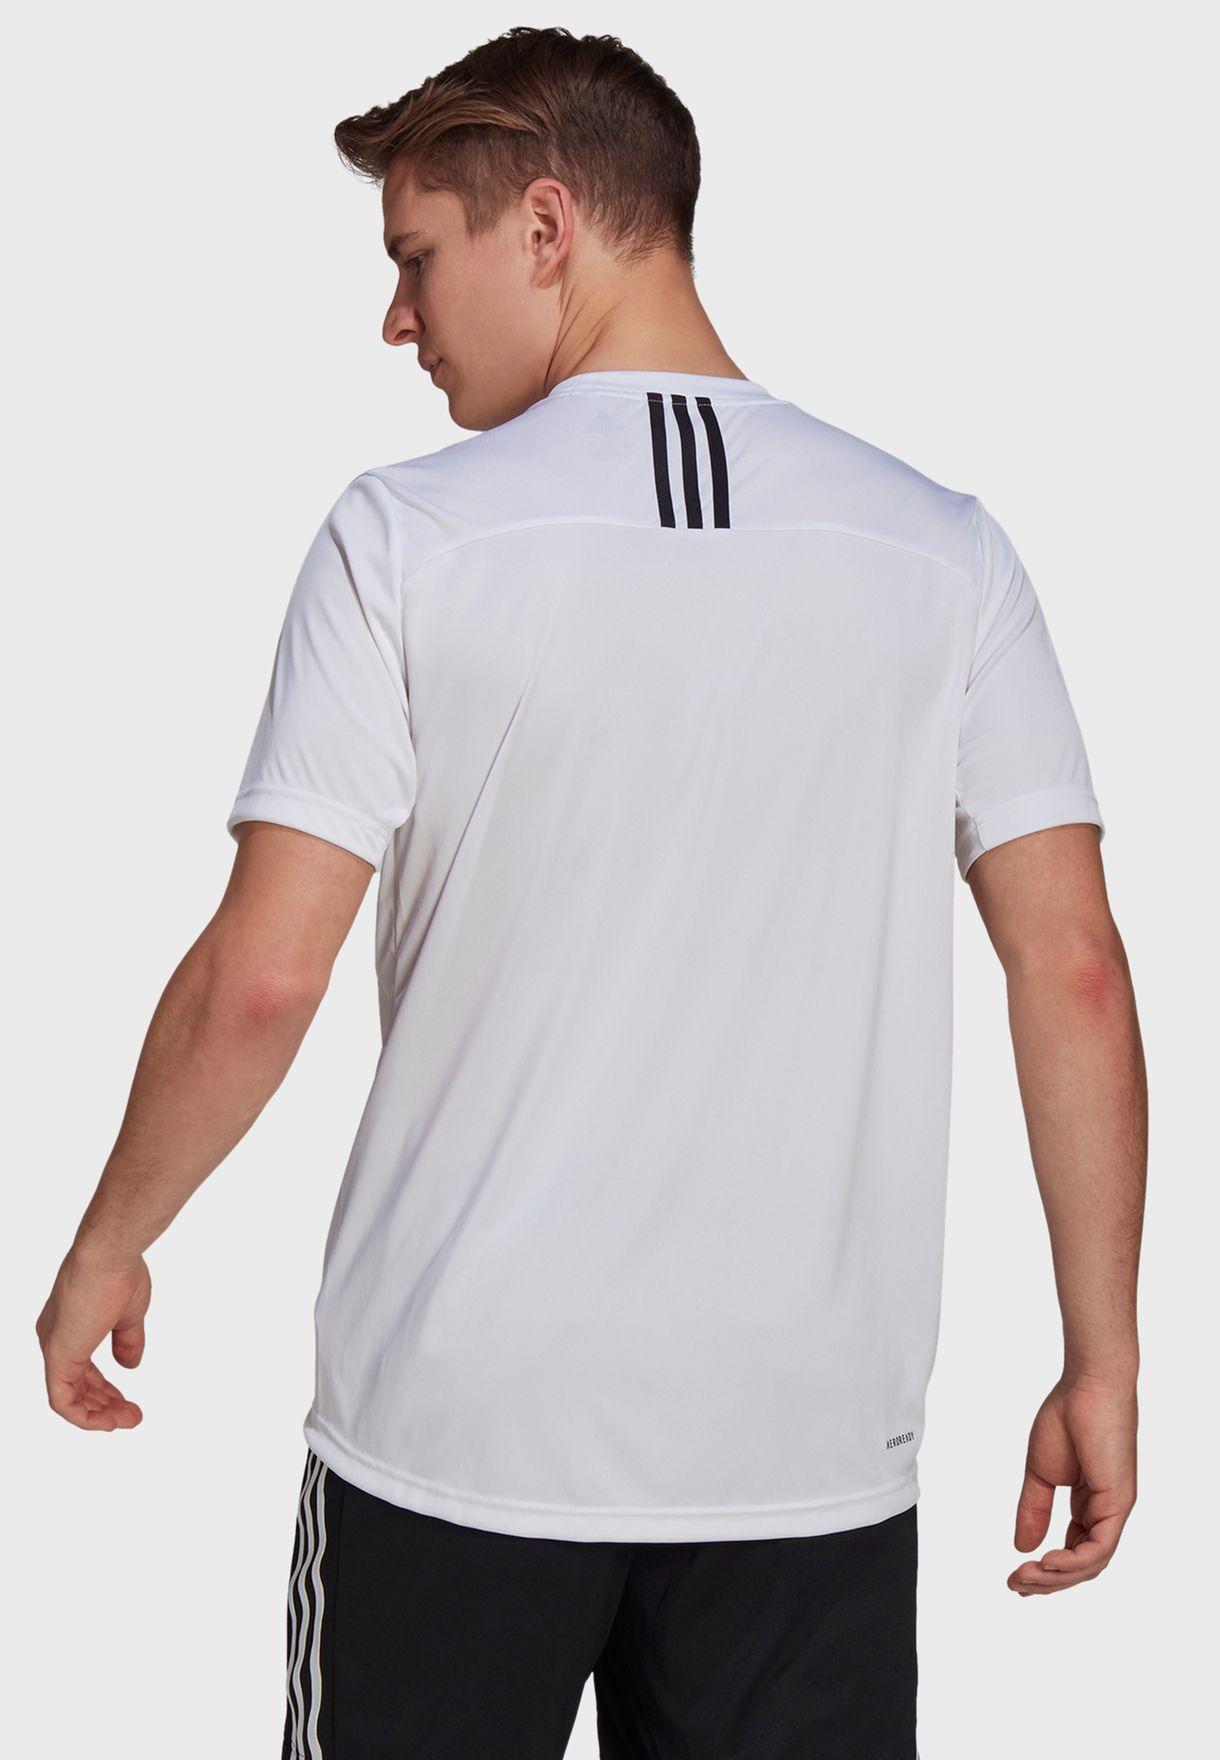 3 Stripe Back T-Shirt